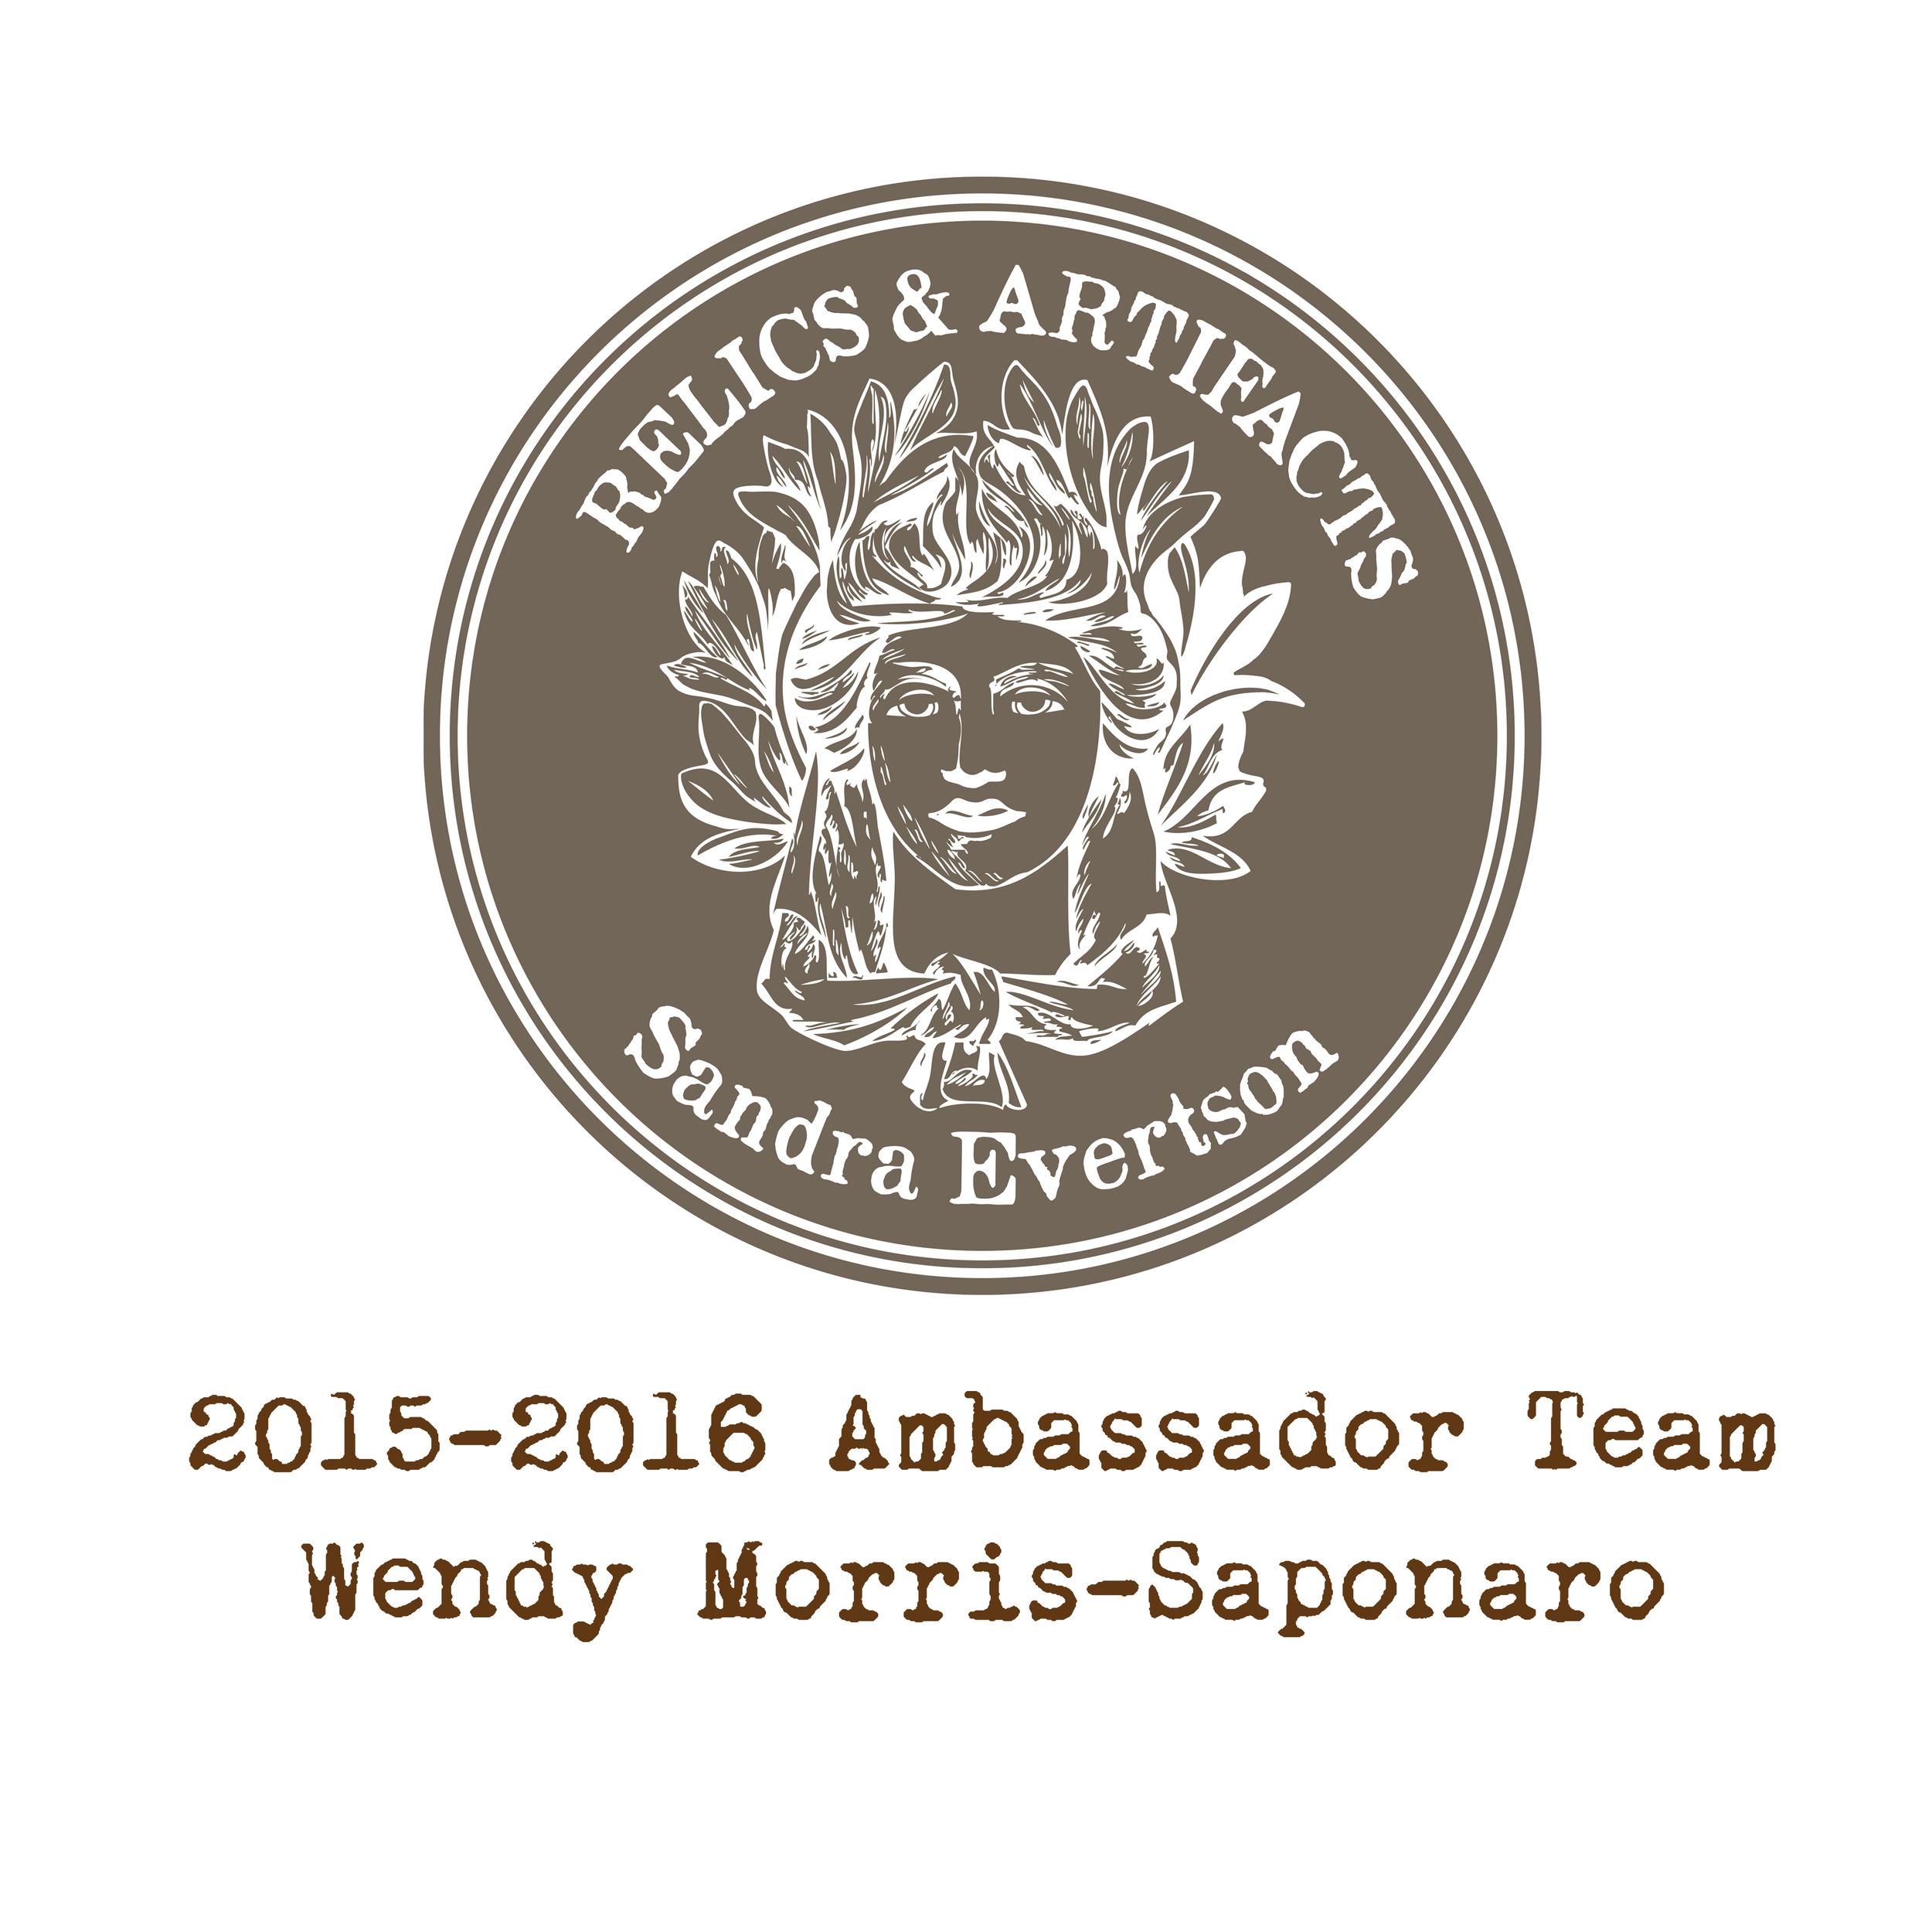 RELICS & ARTIFACTS® Ambassador Snapshot   Wendy Morris-Saponaro, Ambassador Team & Social Media Coordinator